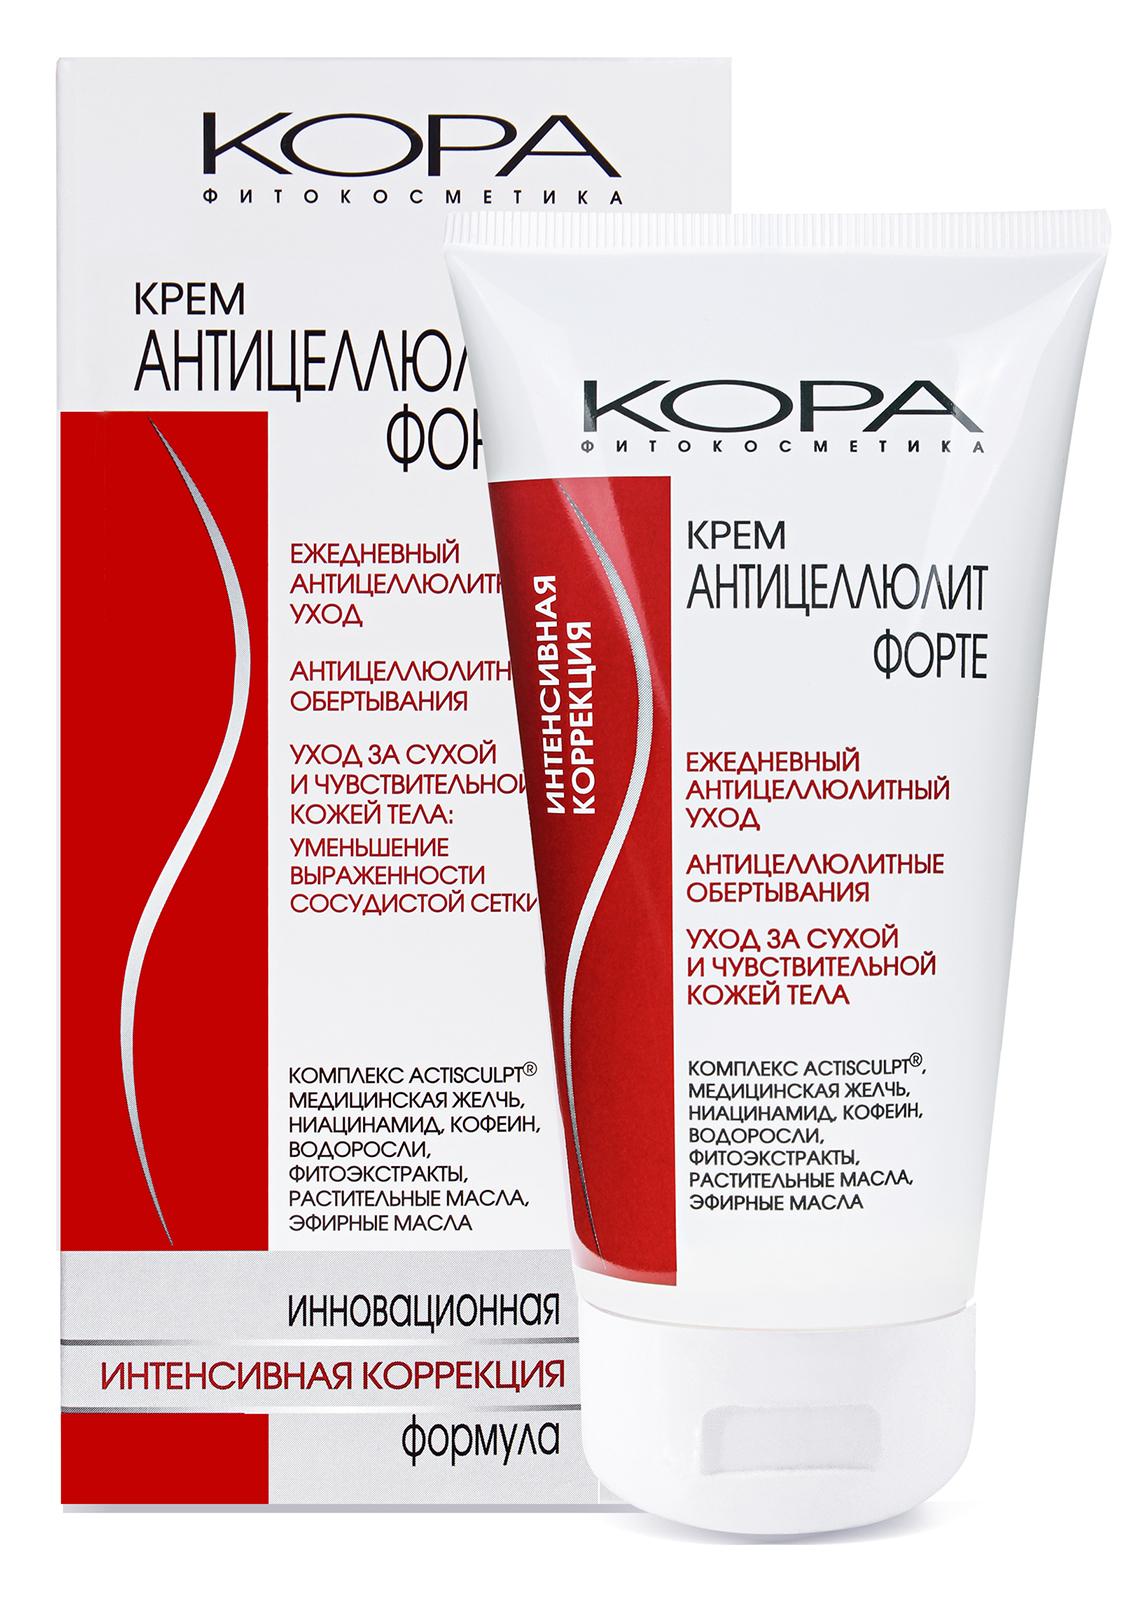 KORA Крем антицеллюлит Форте 150мл